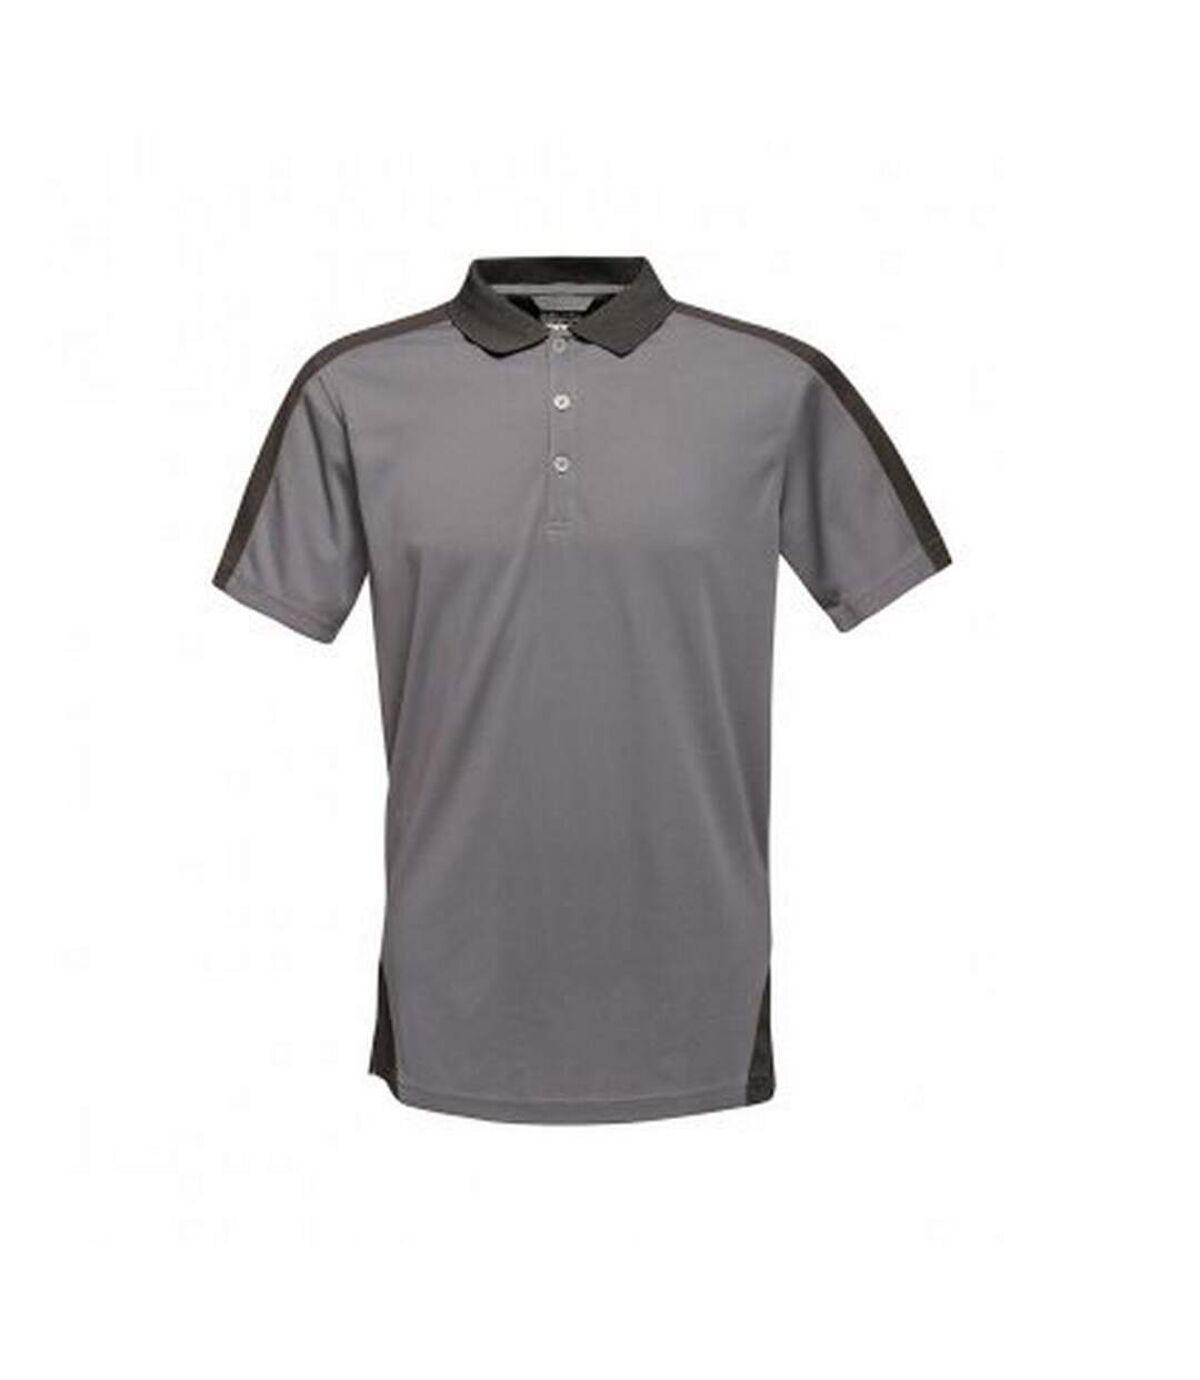 Regatta Contrast Coolweave Pique Polo Shirt (Black/Classic Red) - UTPC3304